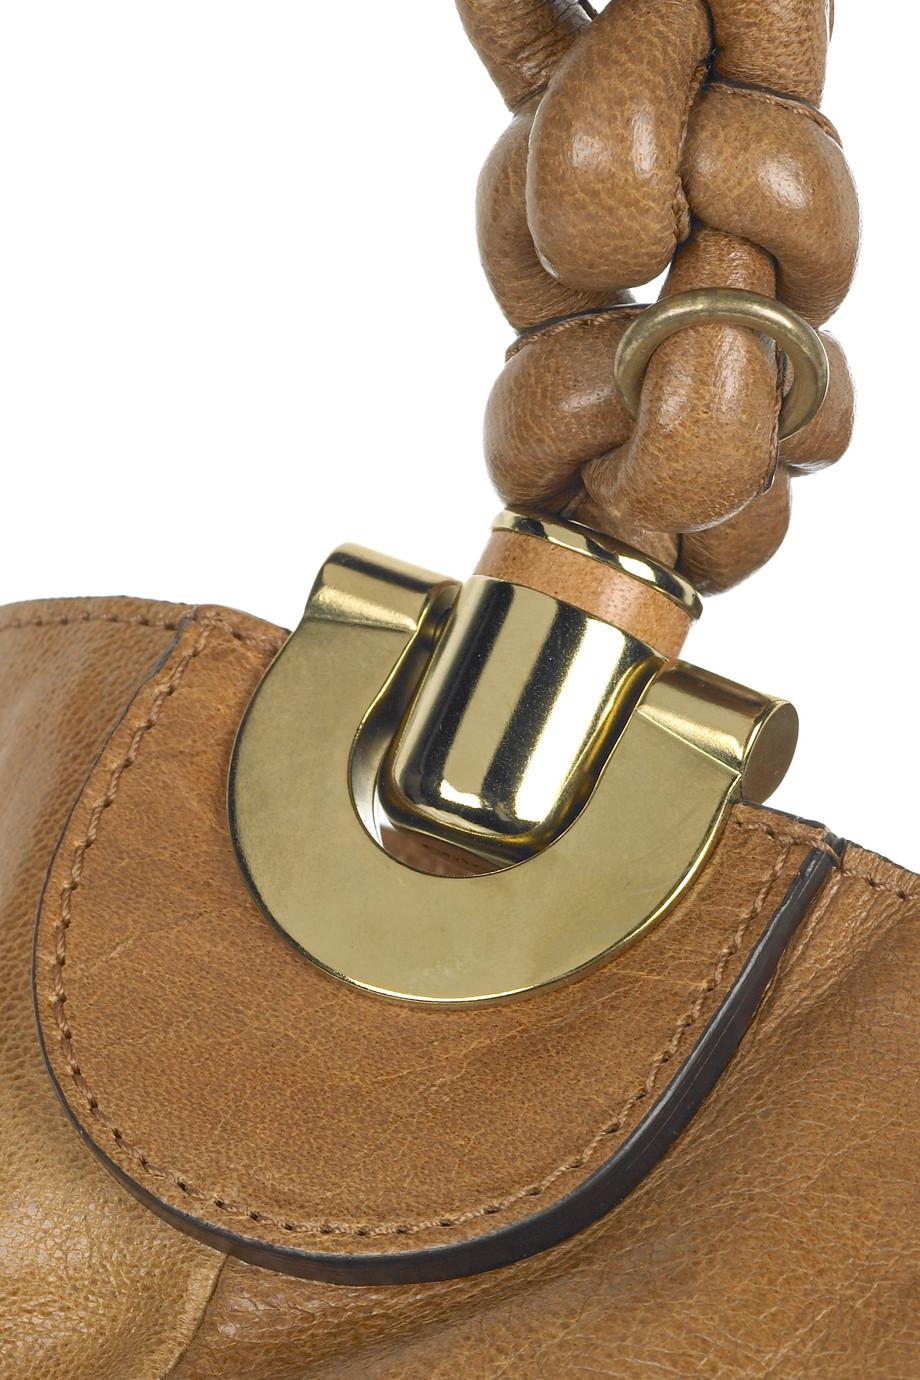 Chlo¨¦ Heloise Leather Hobo Bag in Beige (camel) | Lyst